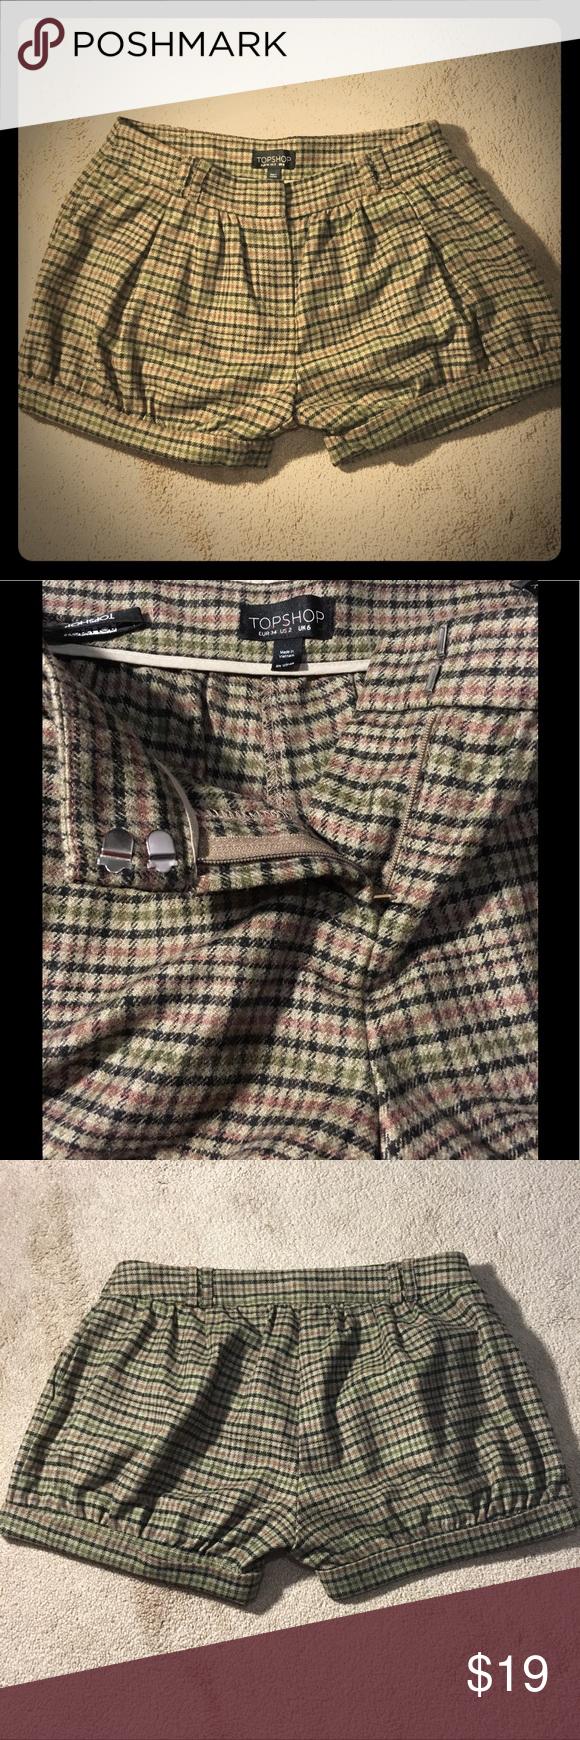 Wool Shorts London Fashion Plaid UK Style Plaid